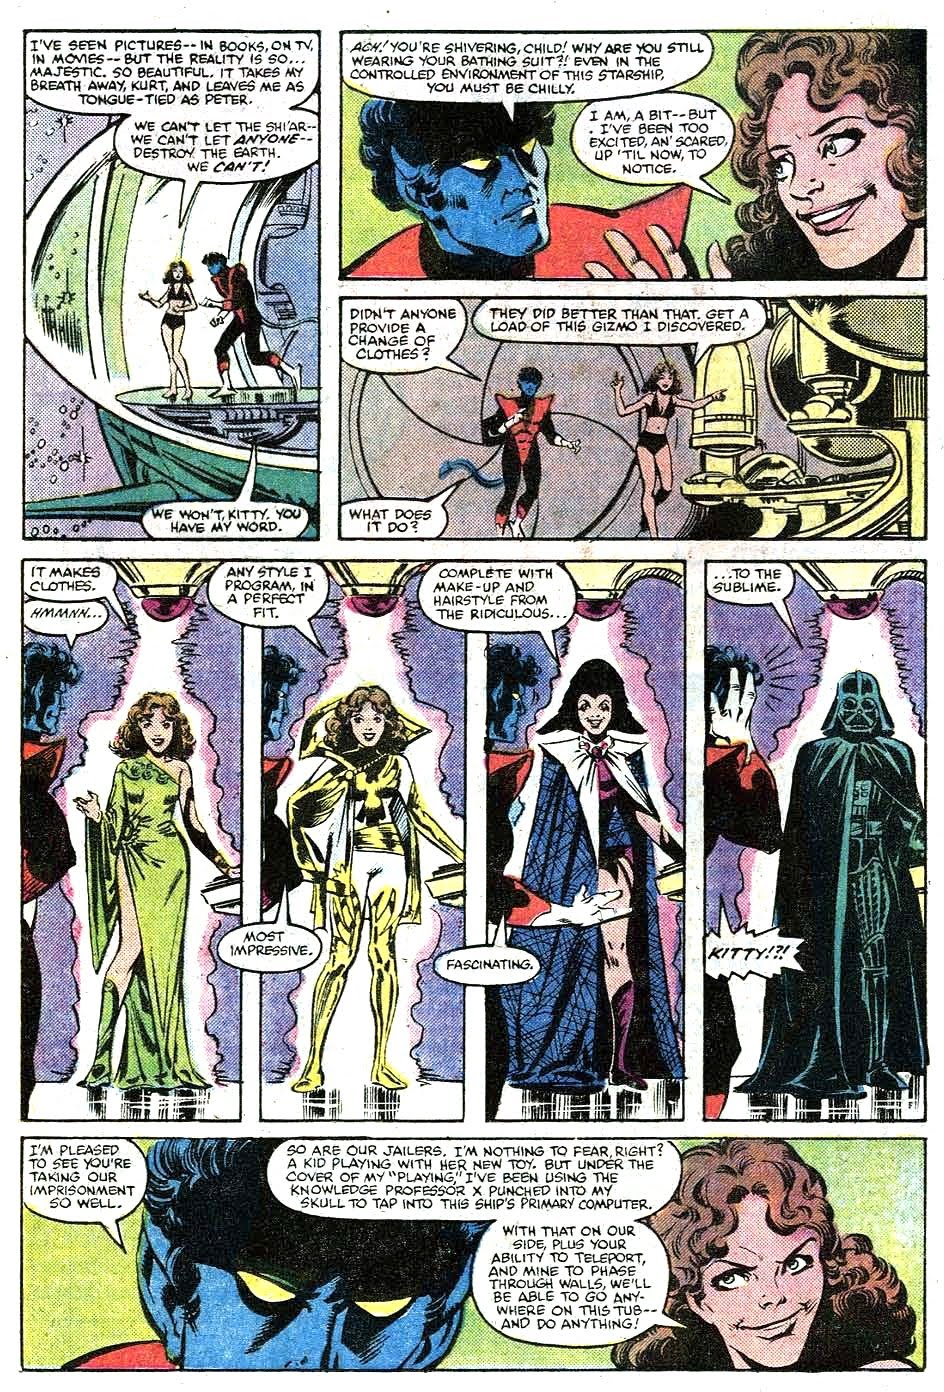 Impreg Comics Amazing marvel comics of the 1980s: 1981 - uncanny x-men